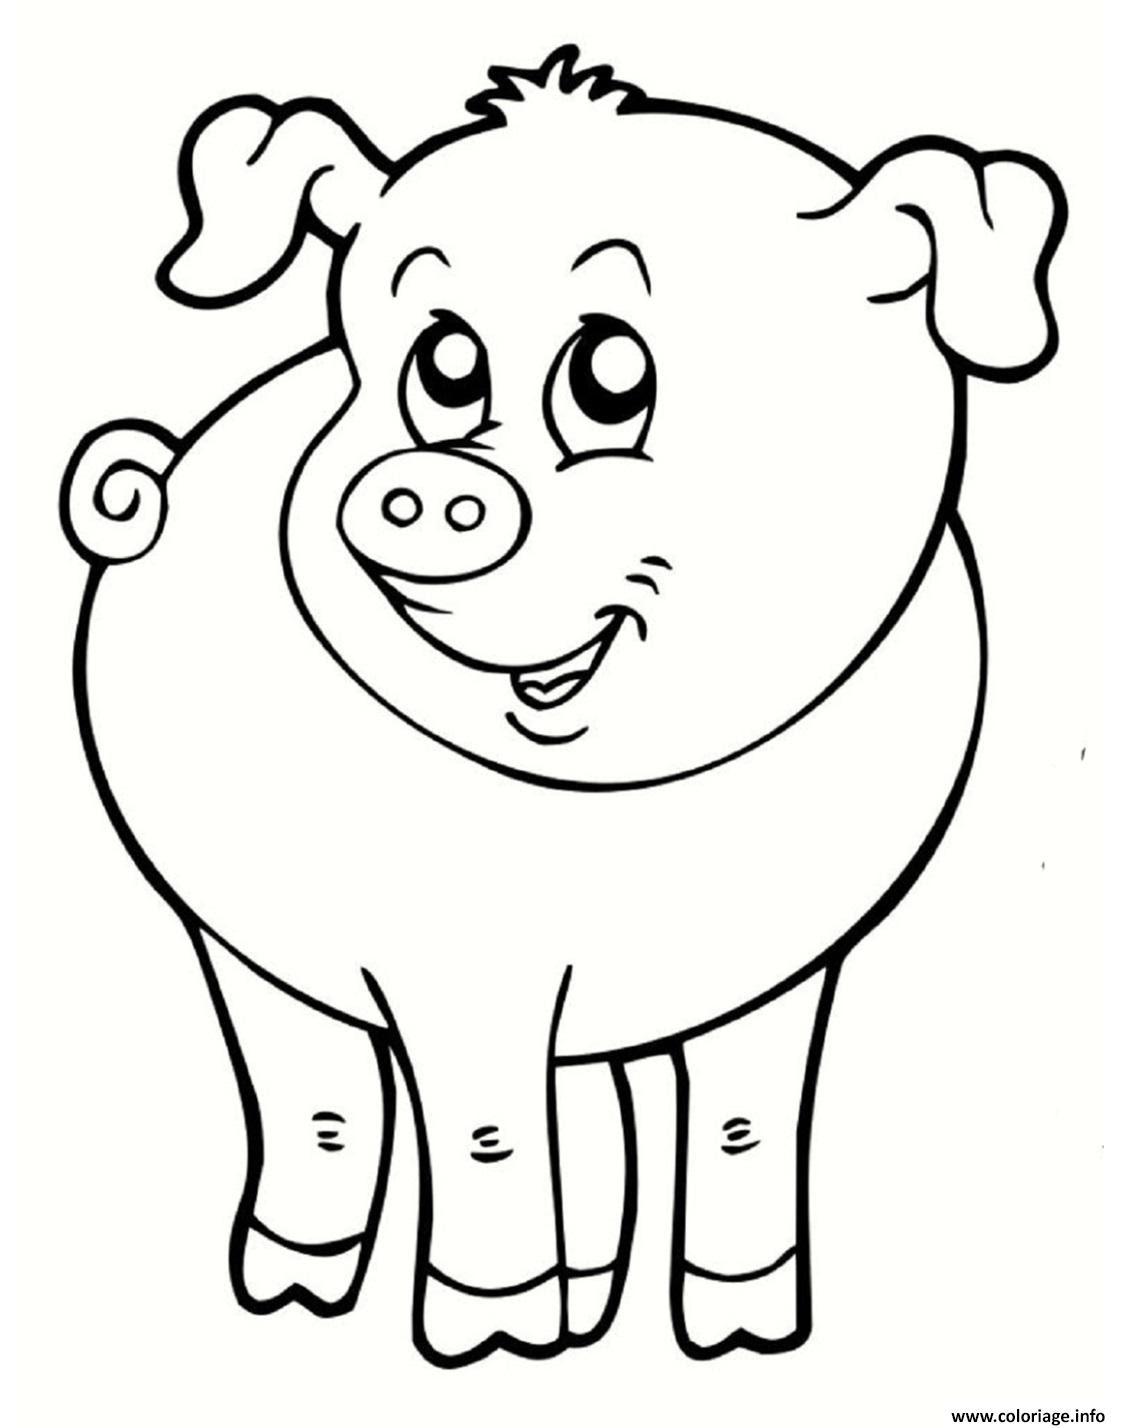 Coloriage Cochon Souriant Animal De La Ferme Dessin  Imprimer